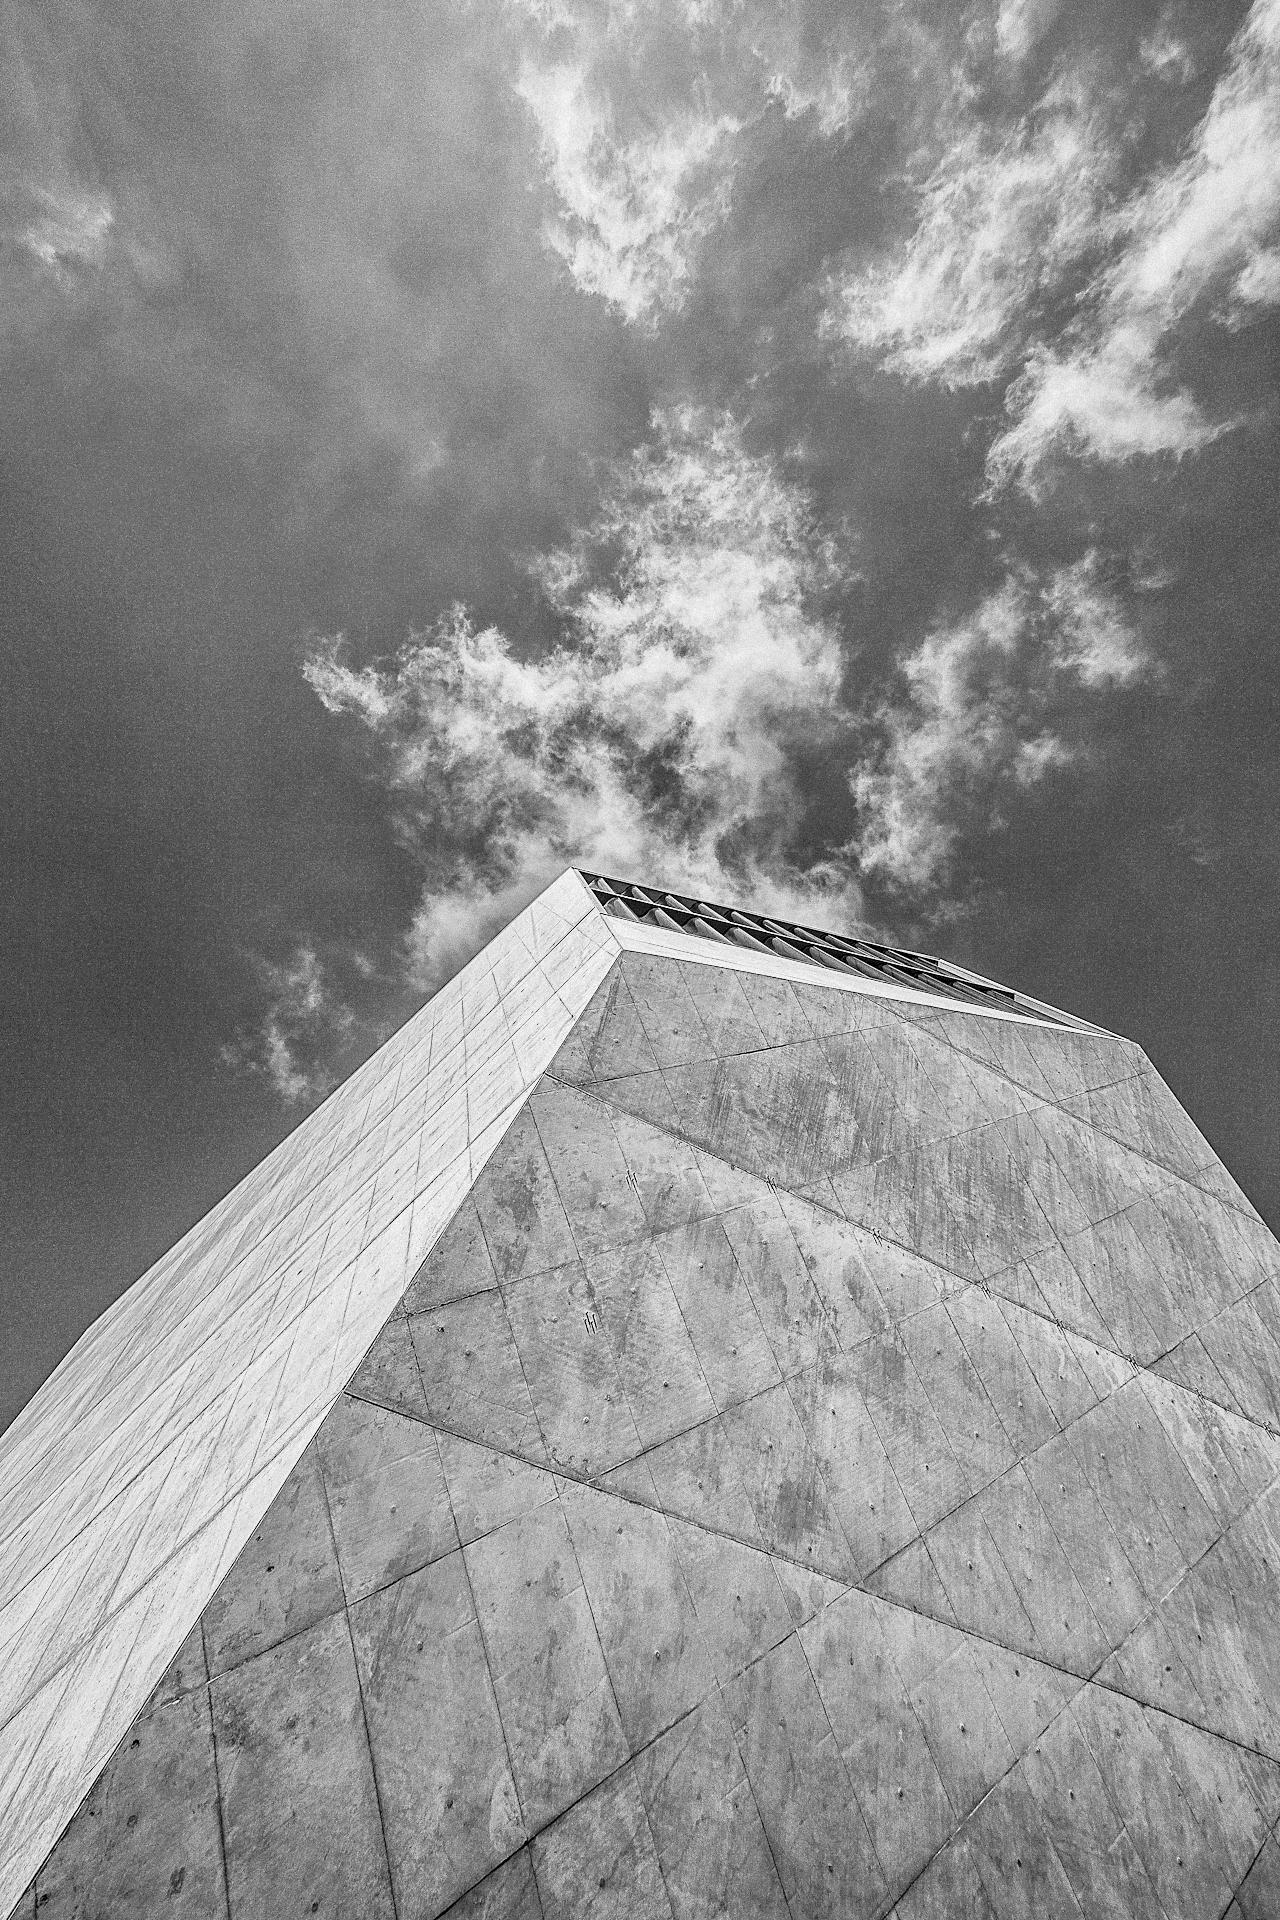 10-Aniversario-Casa-da-Musica-Porto-Reportagem-Fotografica-Photographic-Coverage-Fotografia-Photography-Arquitectura-Architecture-Rem-Koolhaas-bonjourmolotov-42N2.jpg